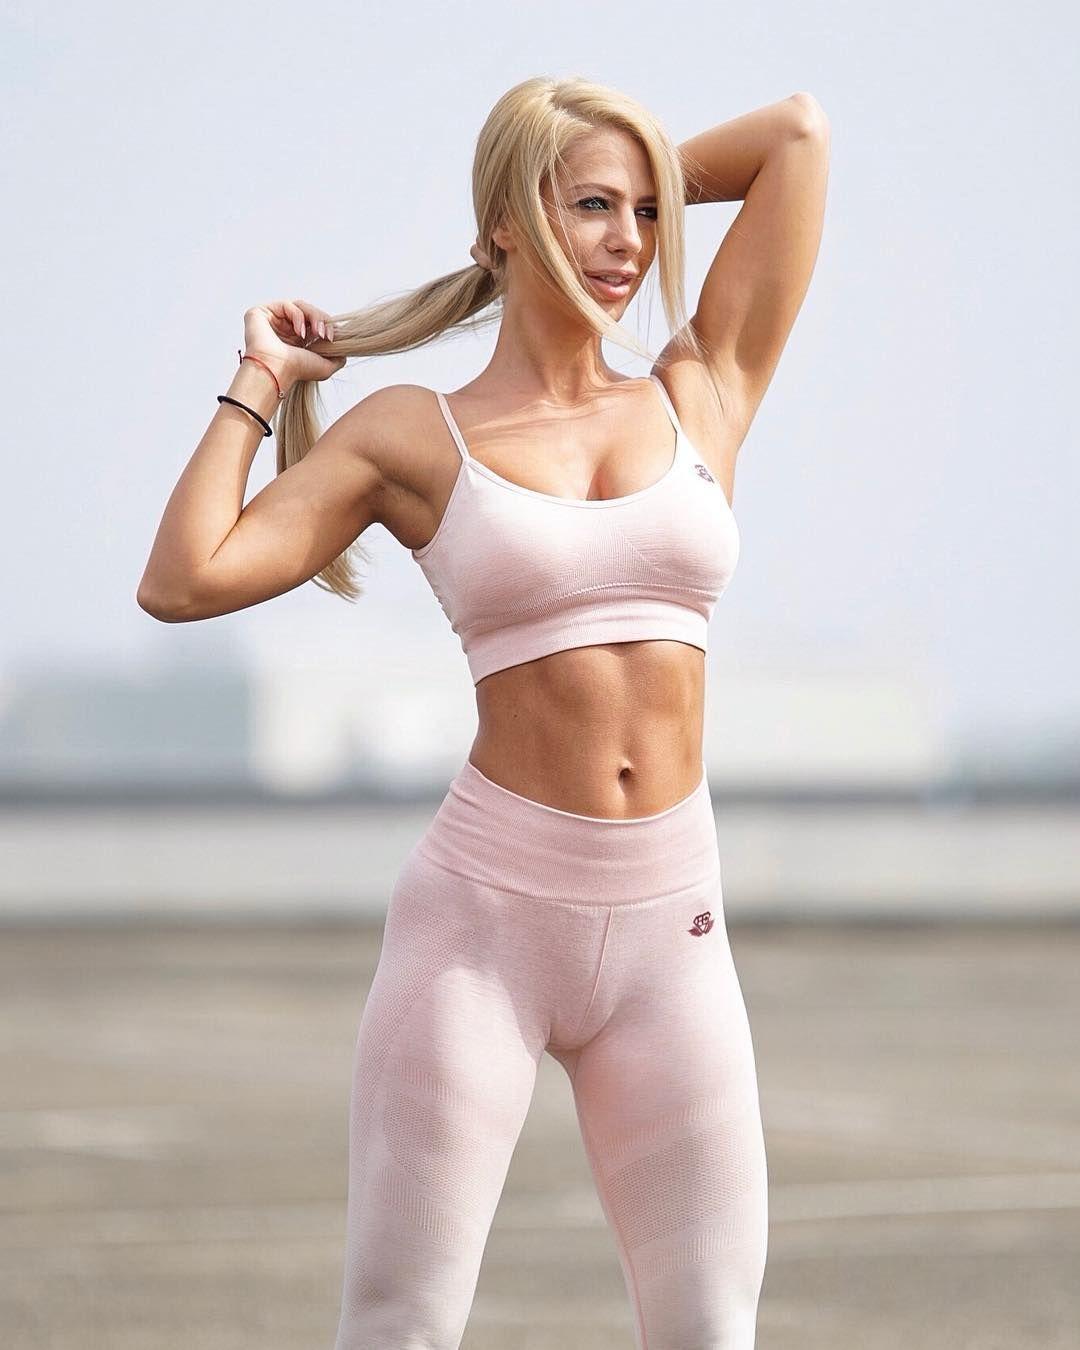 Girl in gym yoga pants naked